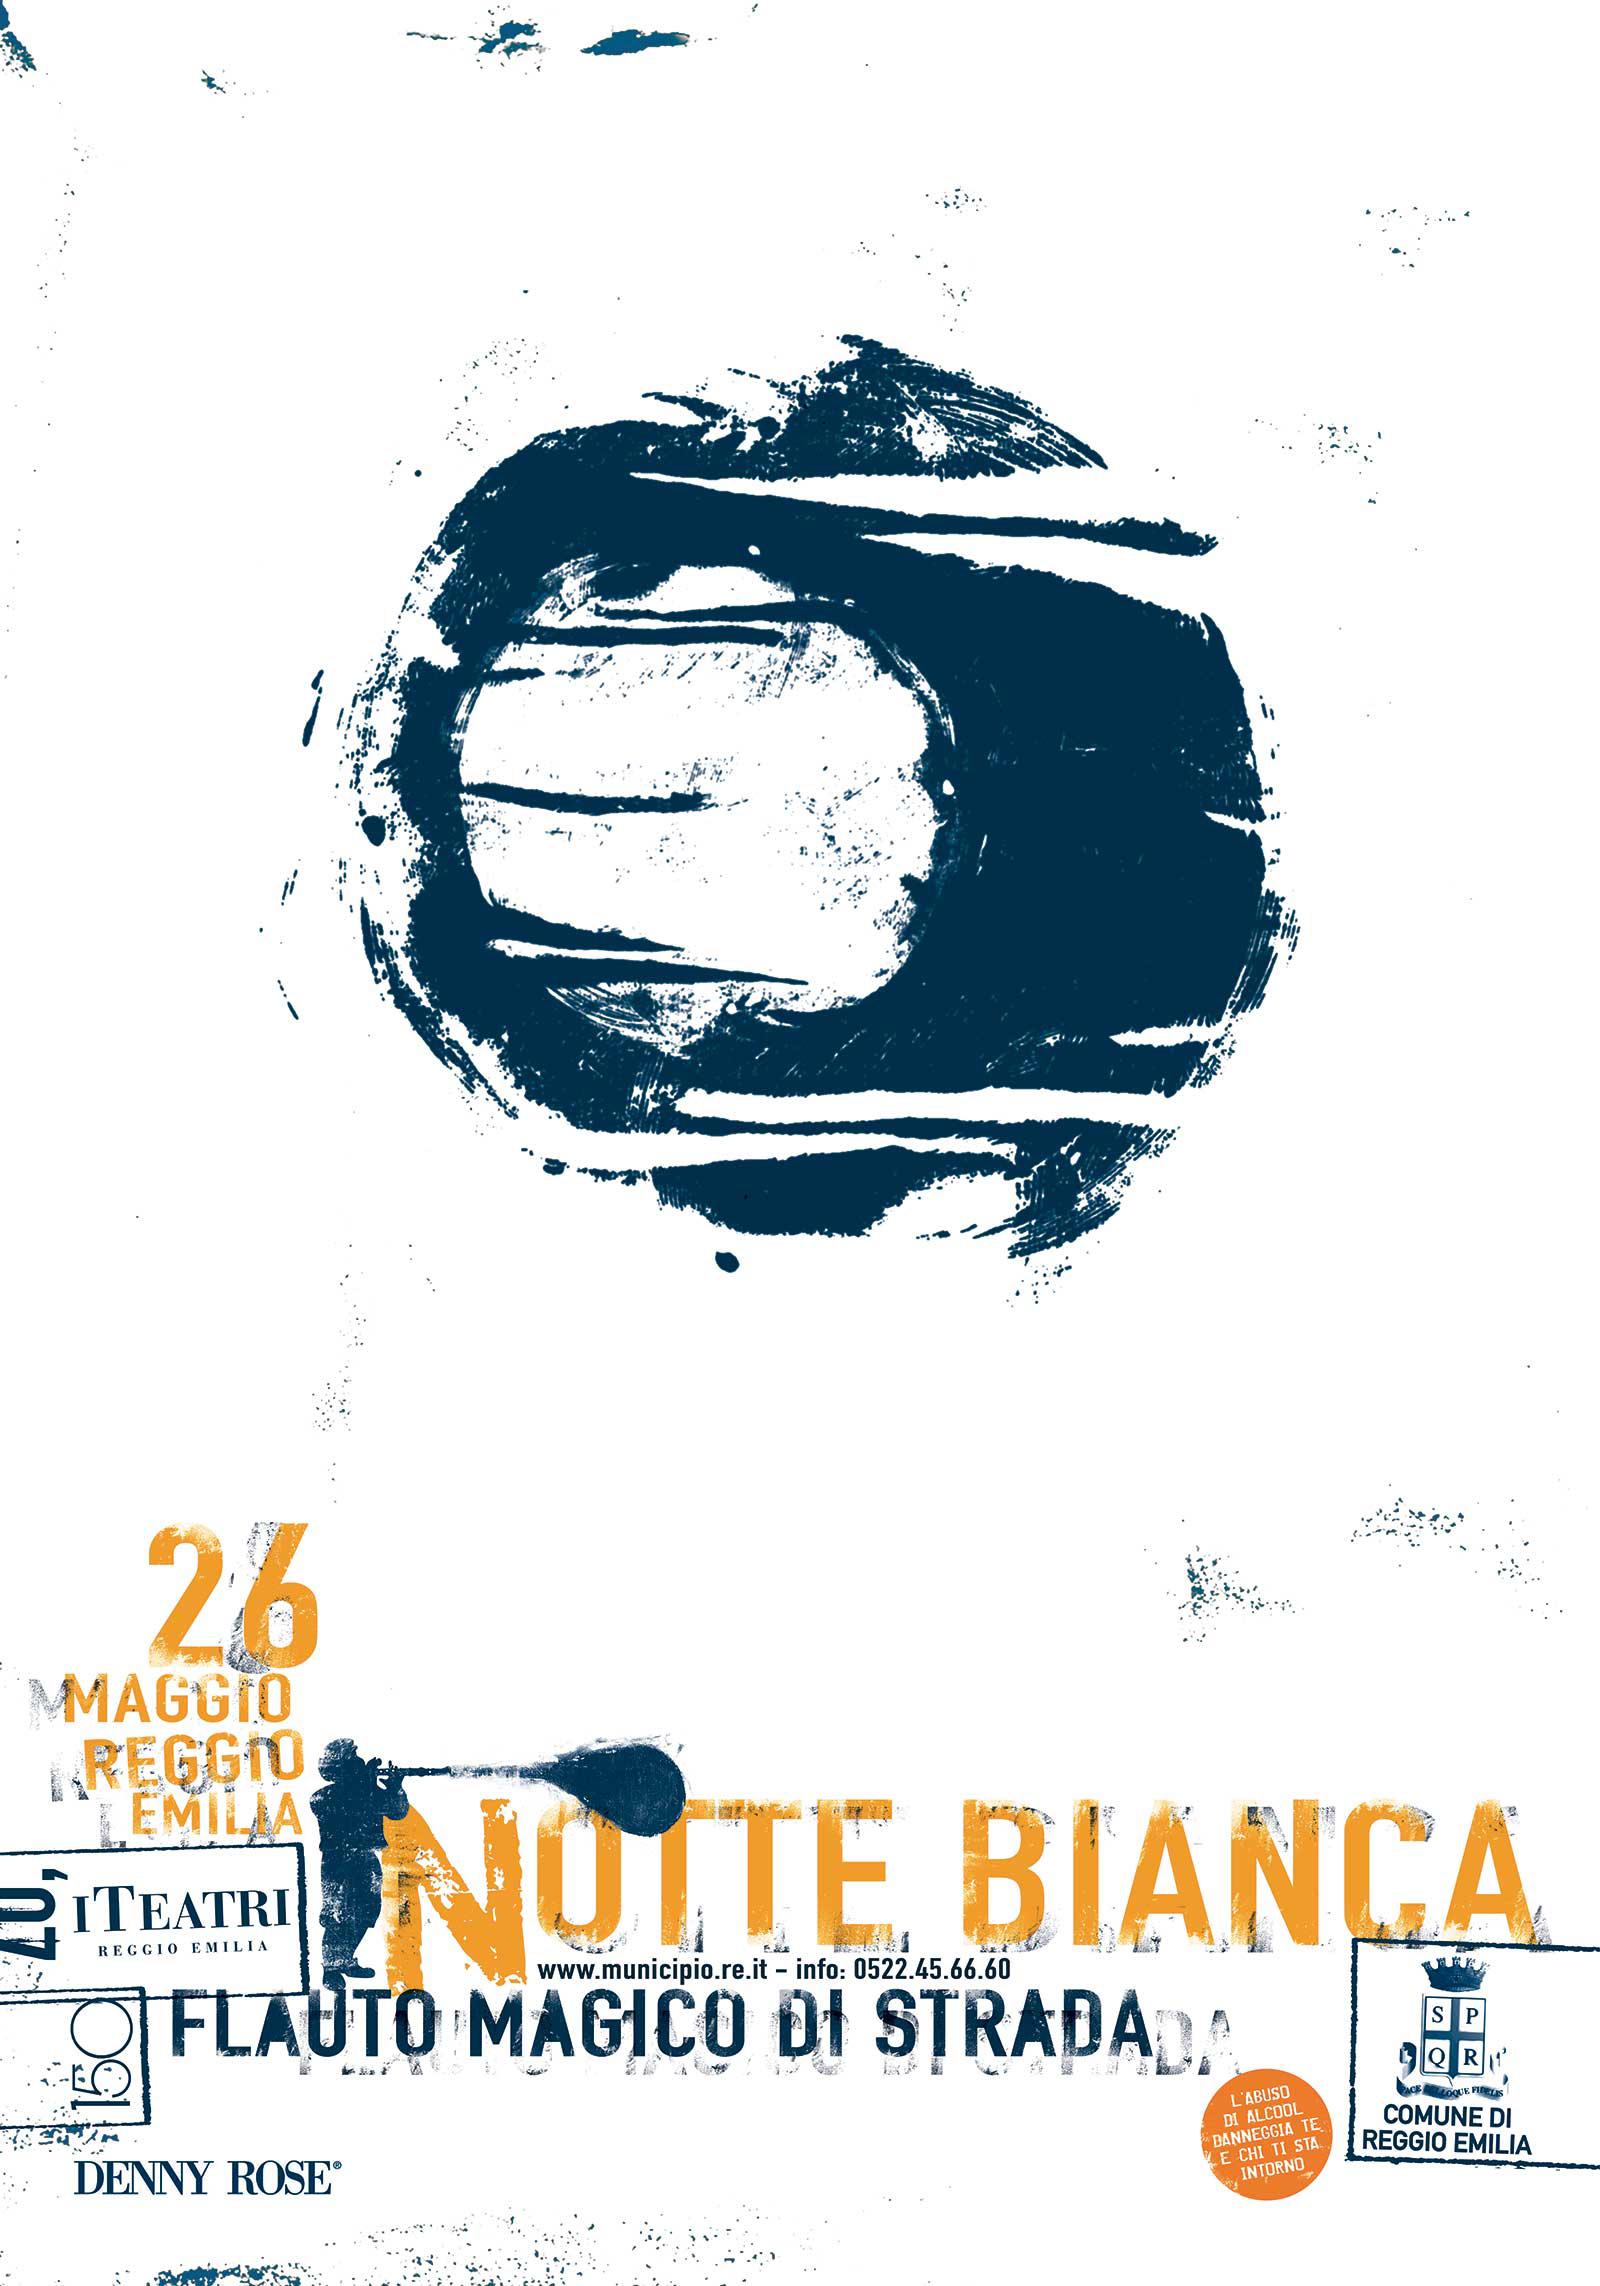 NOTTE-BIANCA-flauto_manifesto